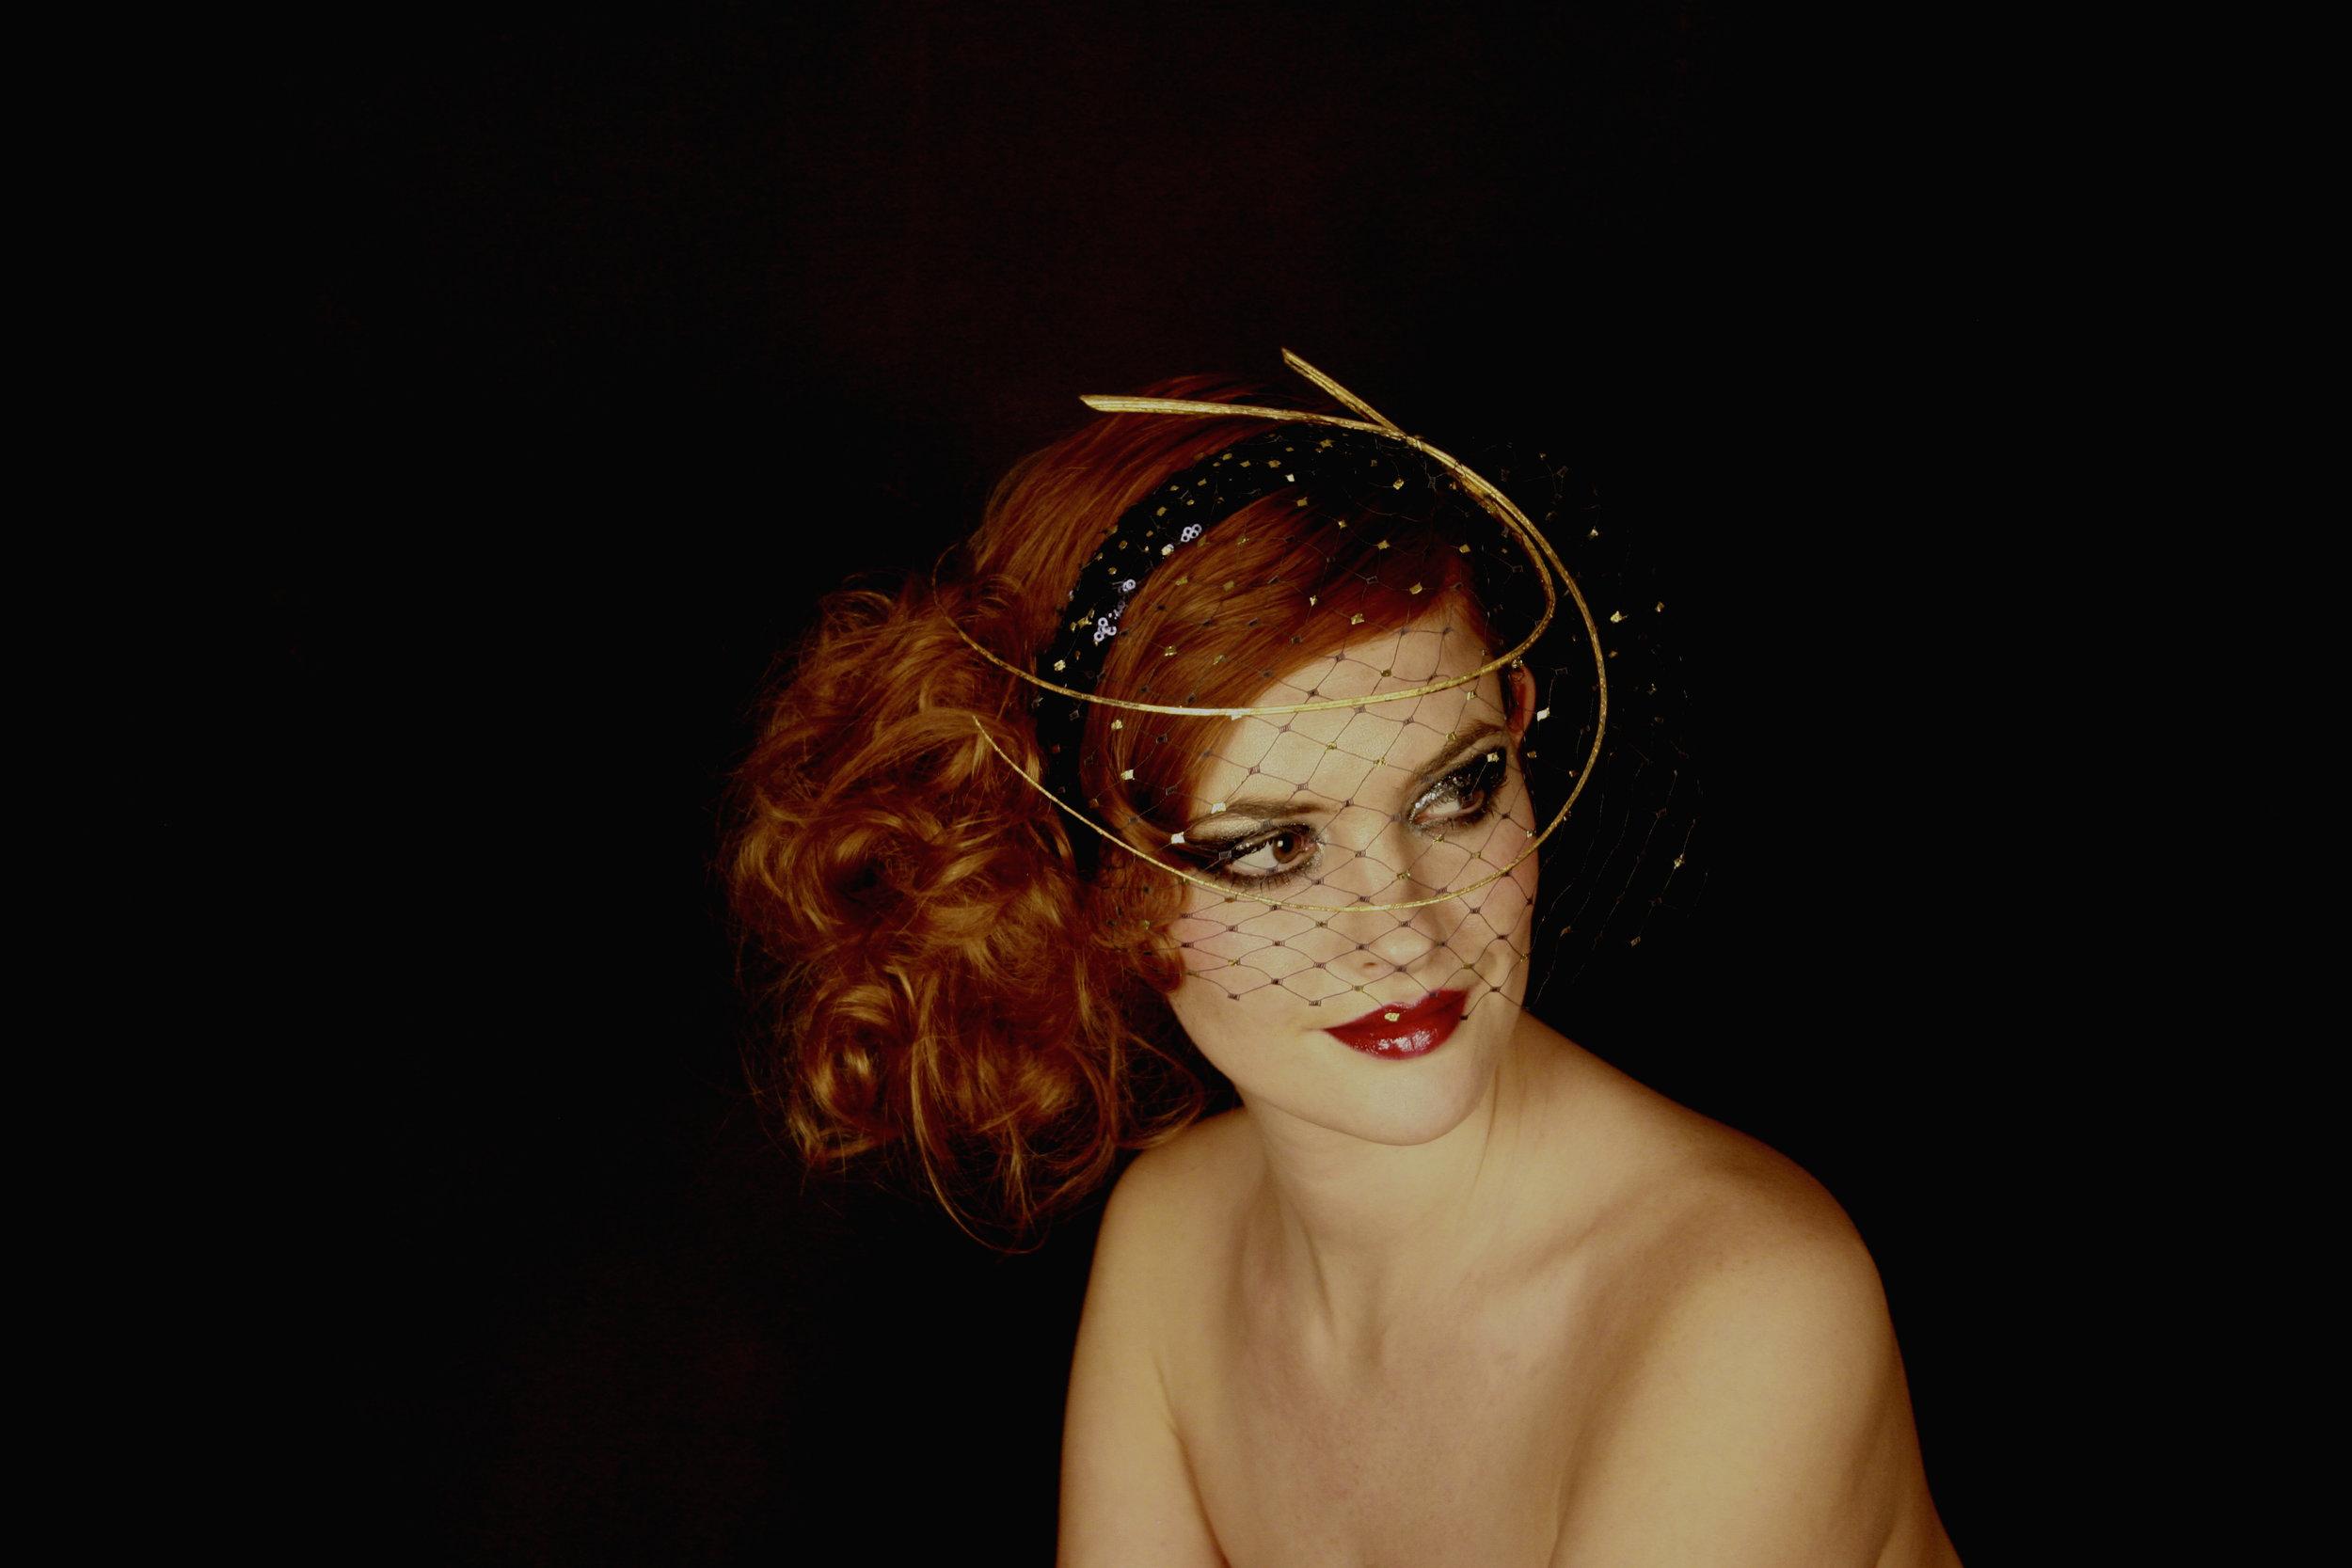 Lyra veiling headpiece